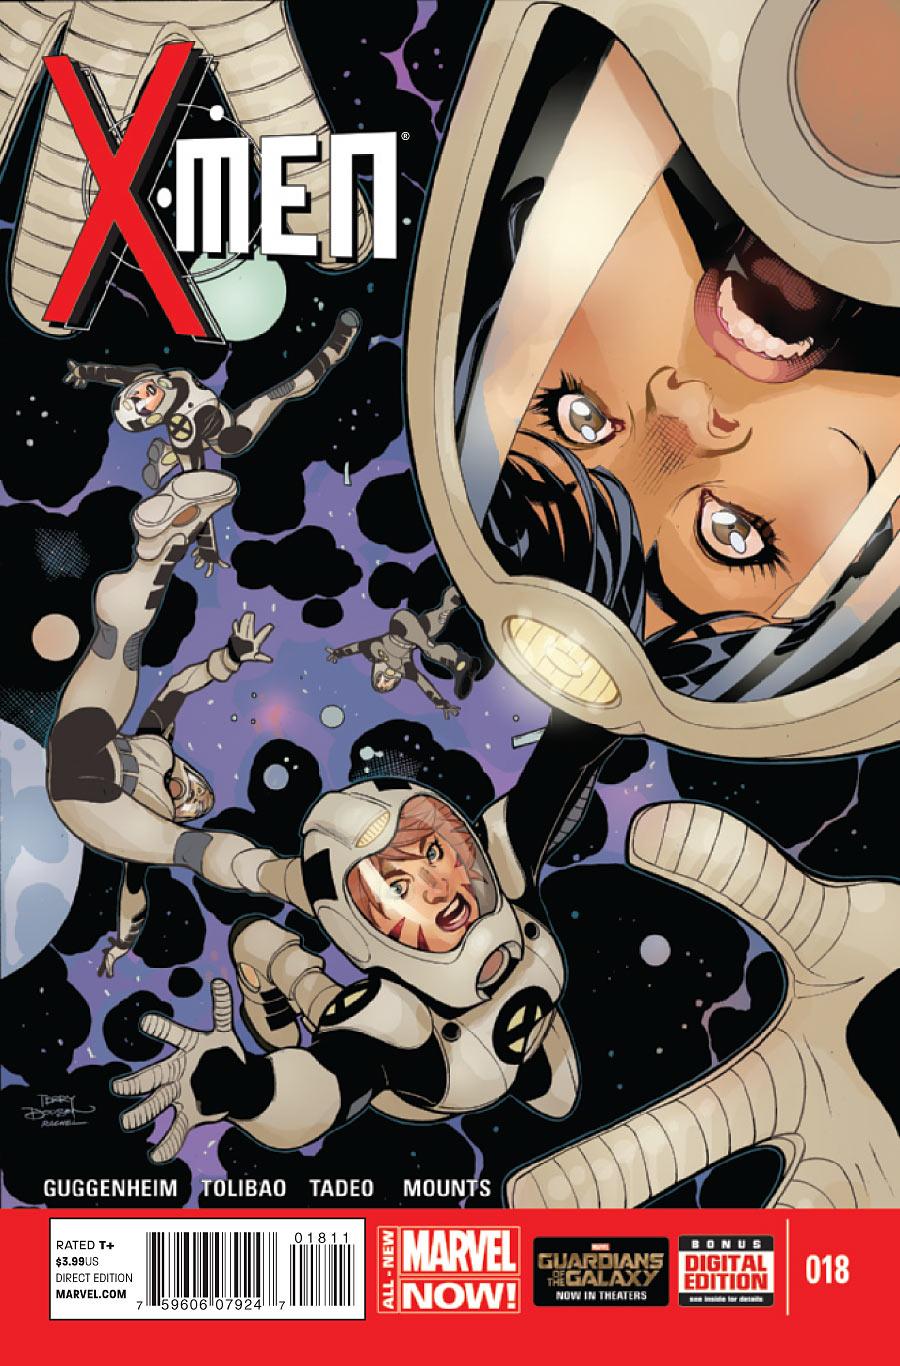 X-Men (Vol. 4) #18 - Cover (Final).jpg